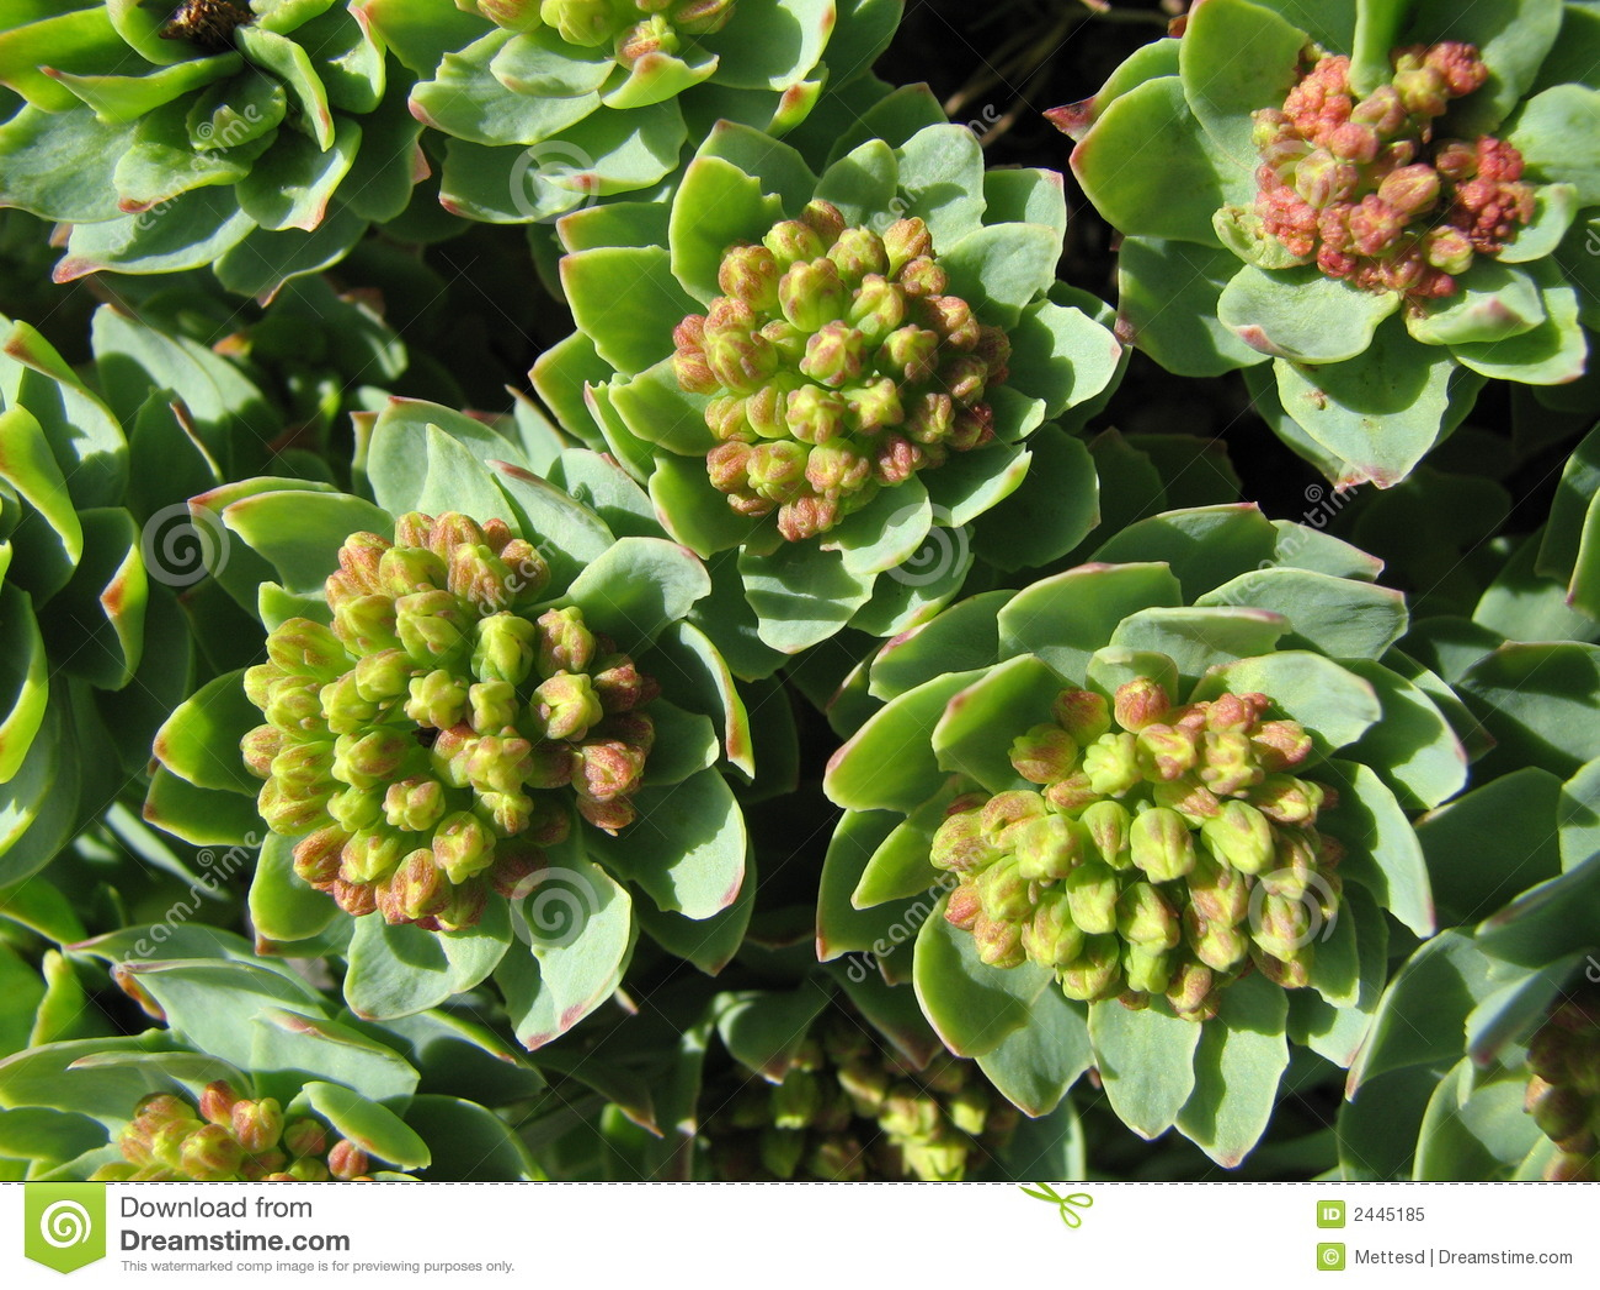 Herbal medicine - roseroot